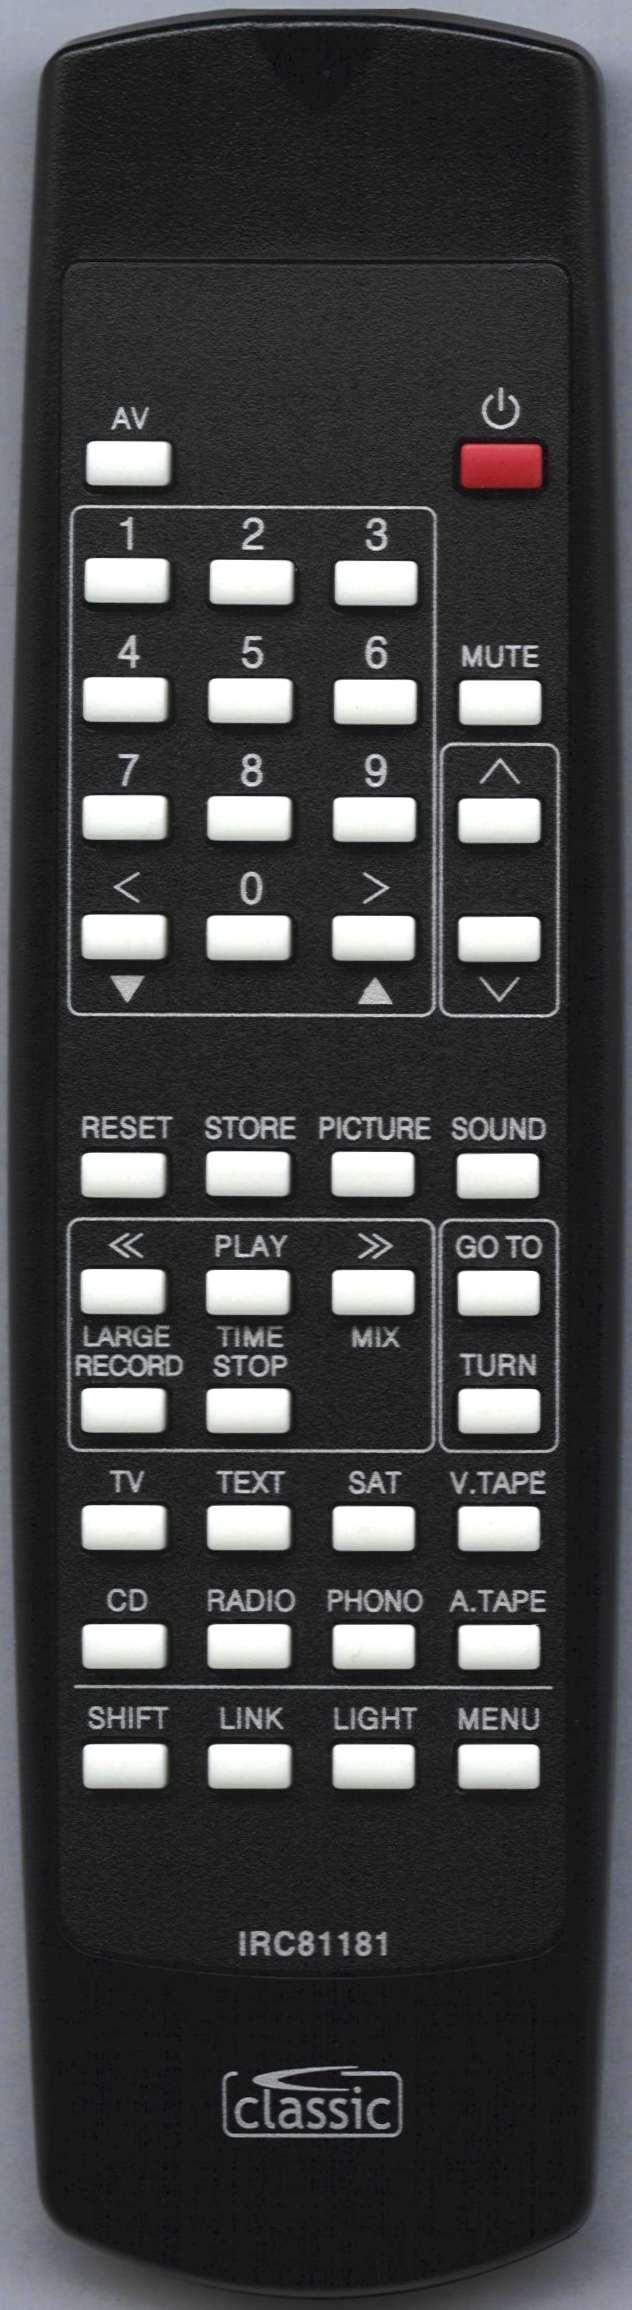 Bang & Olufsen BEOVISION MX 7000 Remote Control